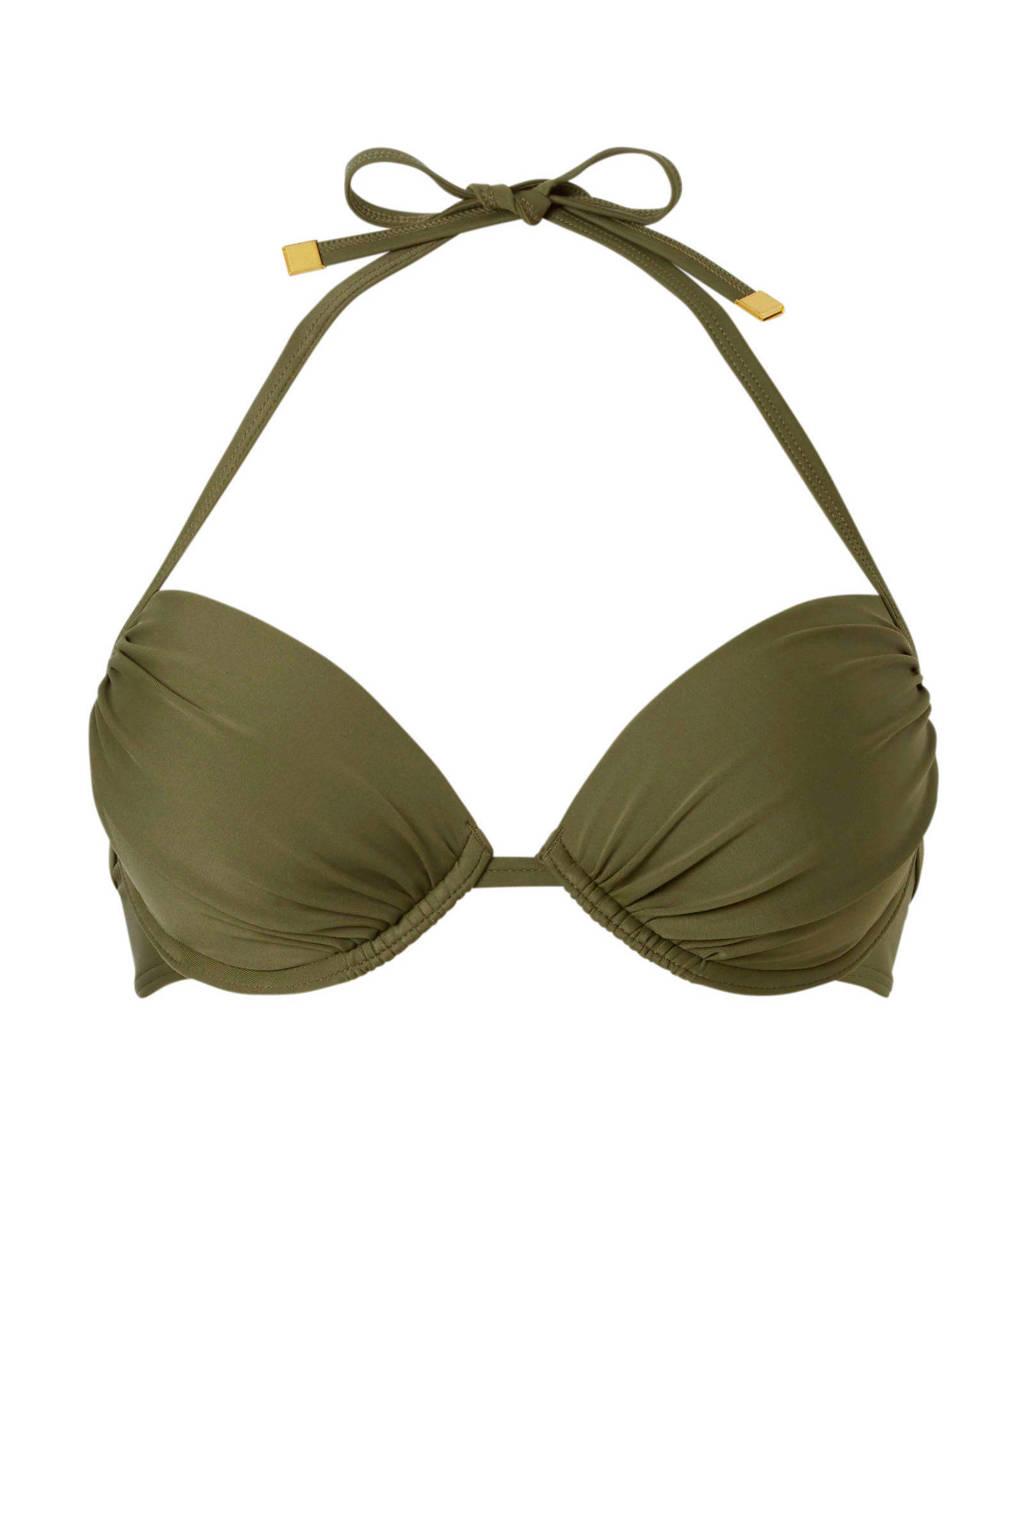 whkmp's beachwave halter bikinitop met uitneembare push up vulling groen, Groen